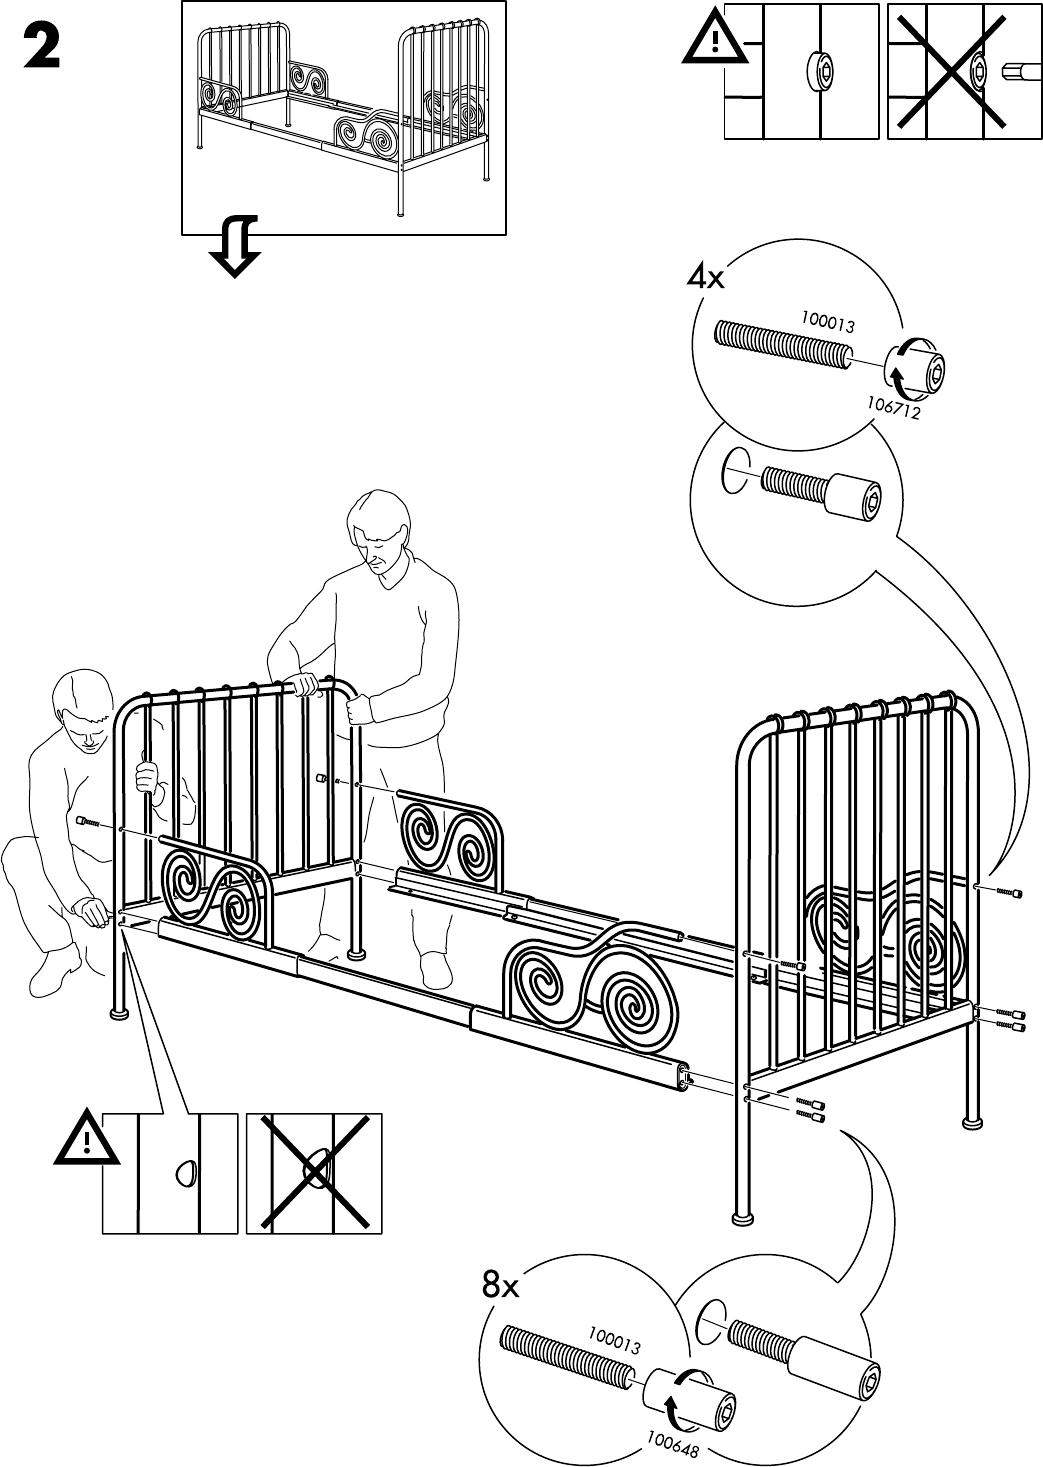 Ikea Bunk Bed Instruction Manual